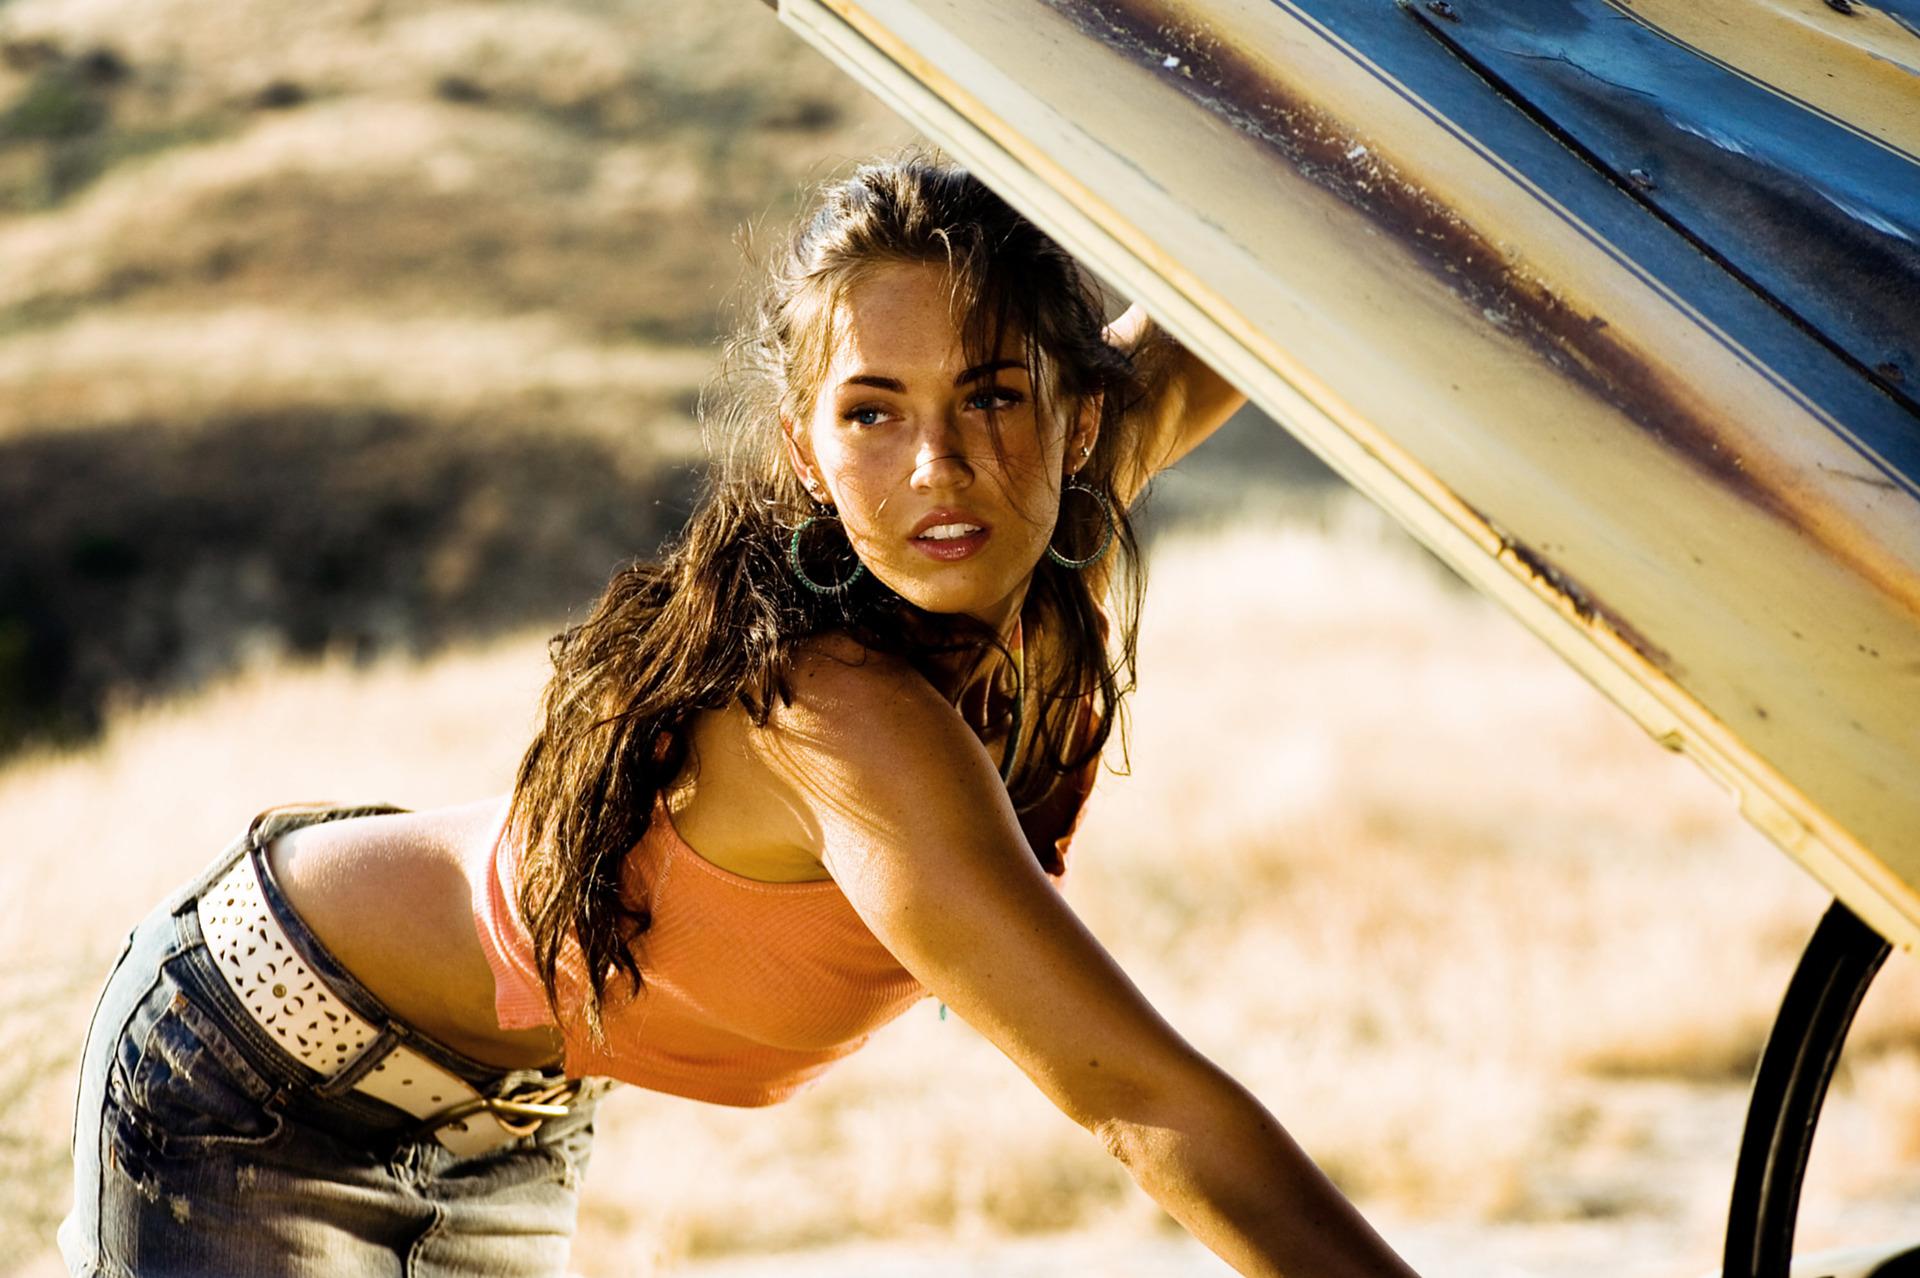 Mikaela Banes played oleh Megan rubah, fox